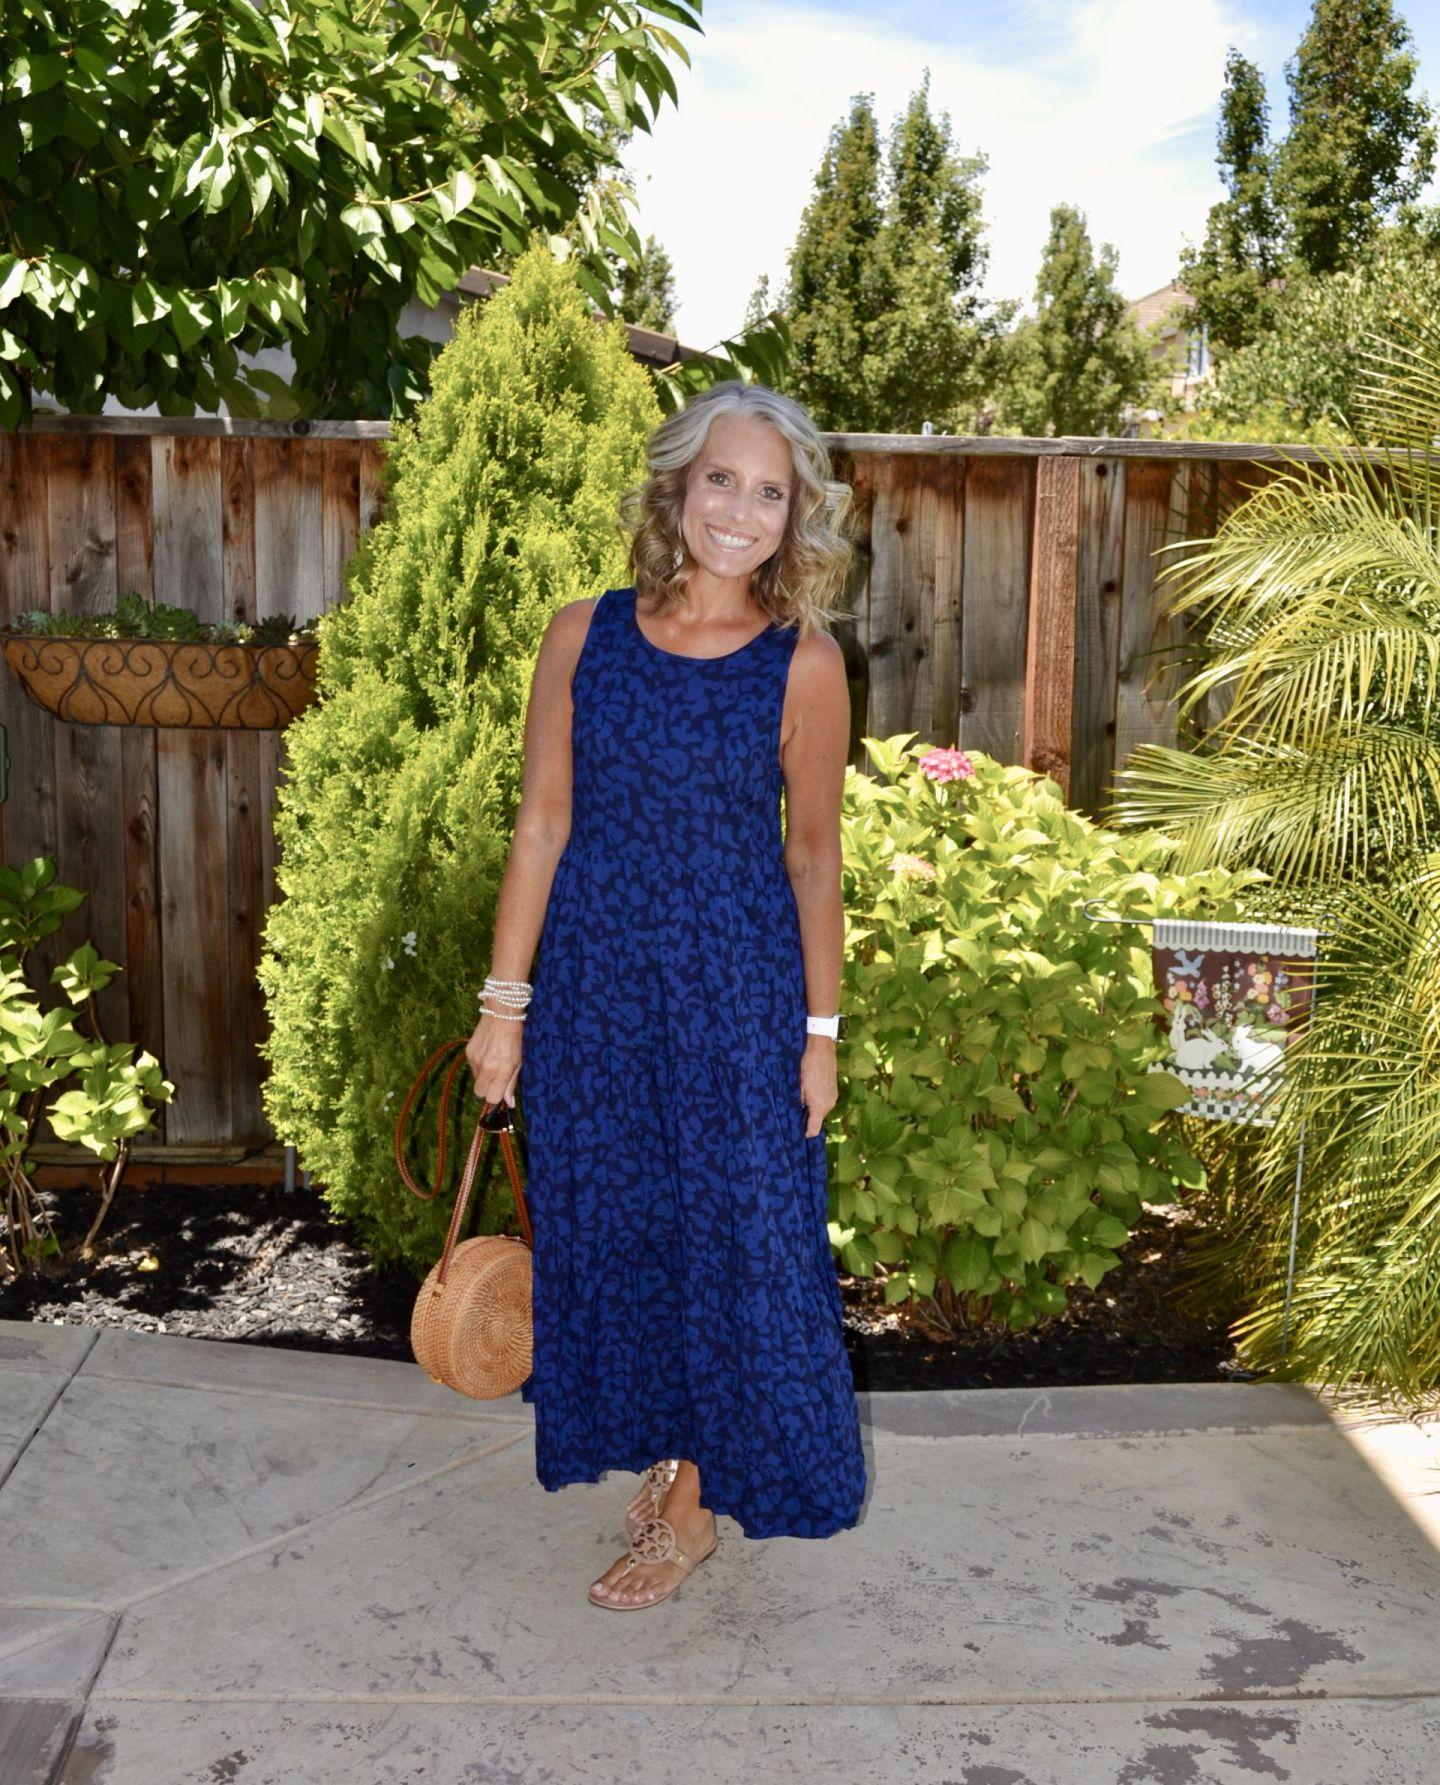 Blue Leopard Dress from Target